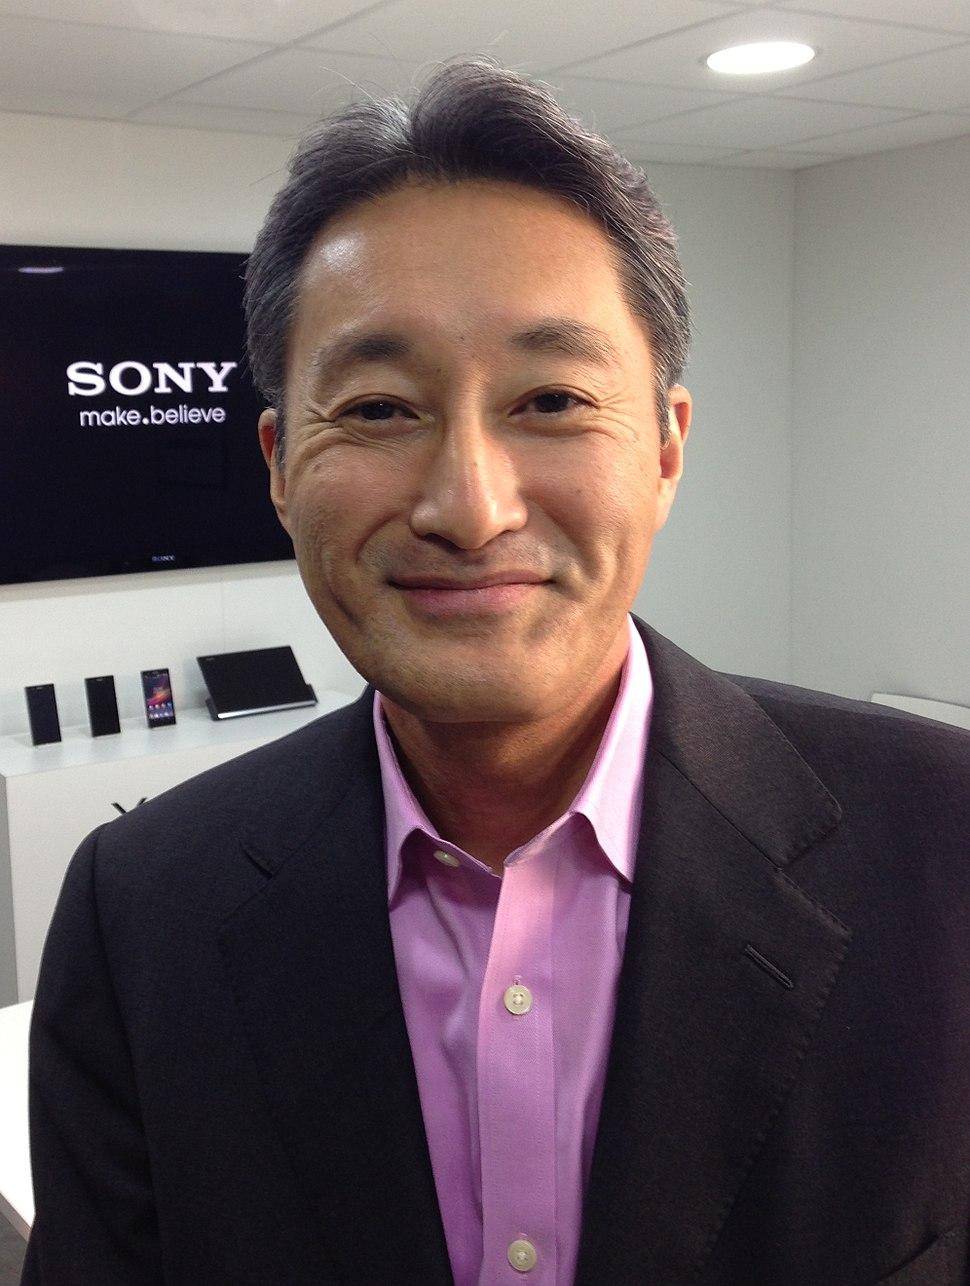 Kazuo Hirai, Sony President - Mobile World Congress 2013 in Barcelona